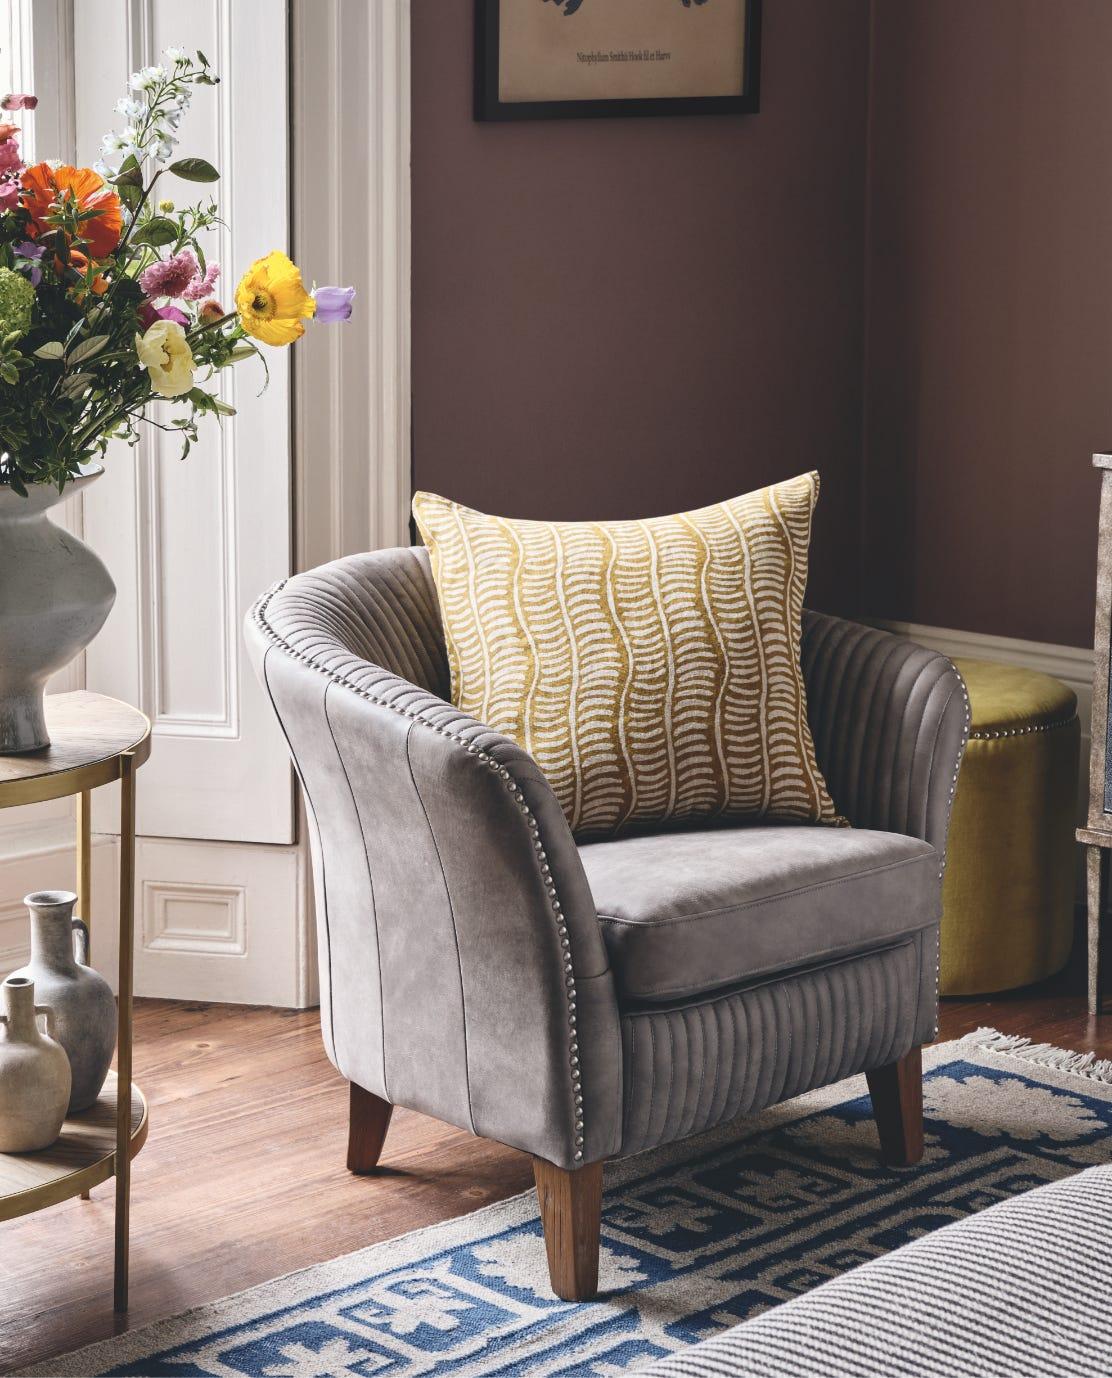 Ash Grey Crosby armchair with a yellow printed cushion